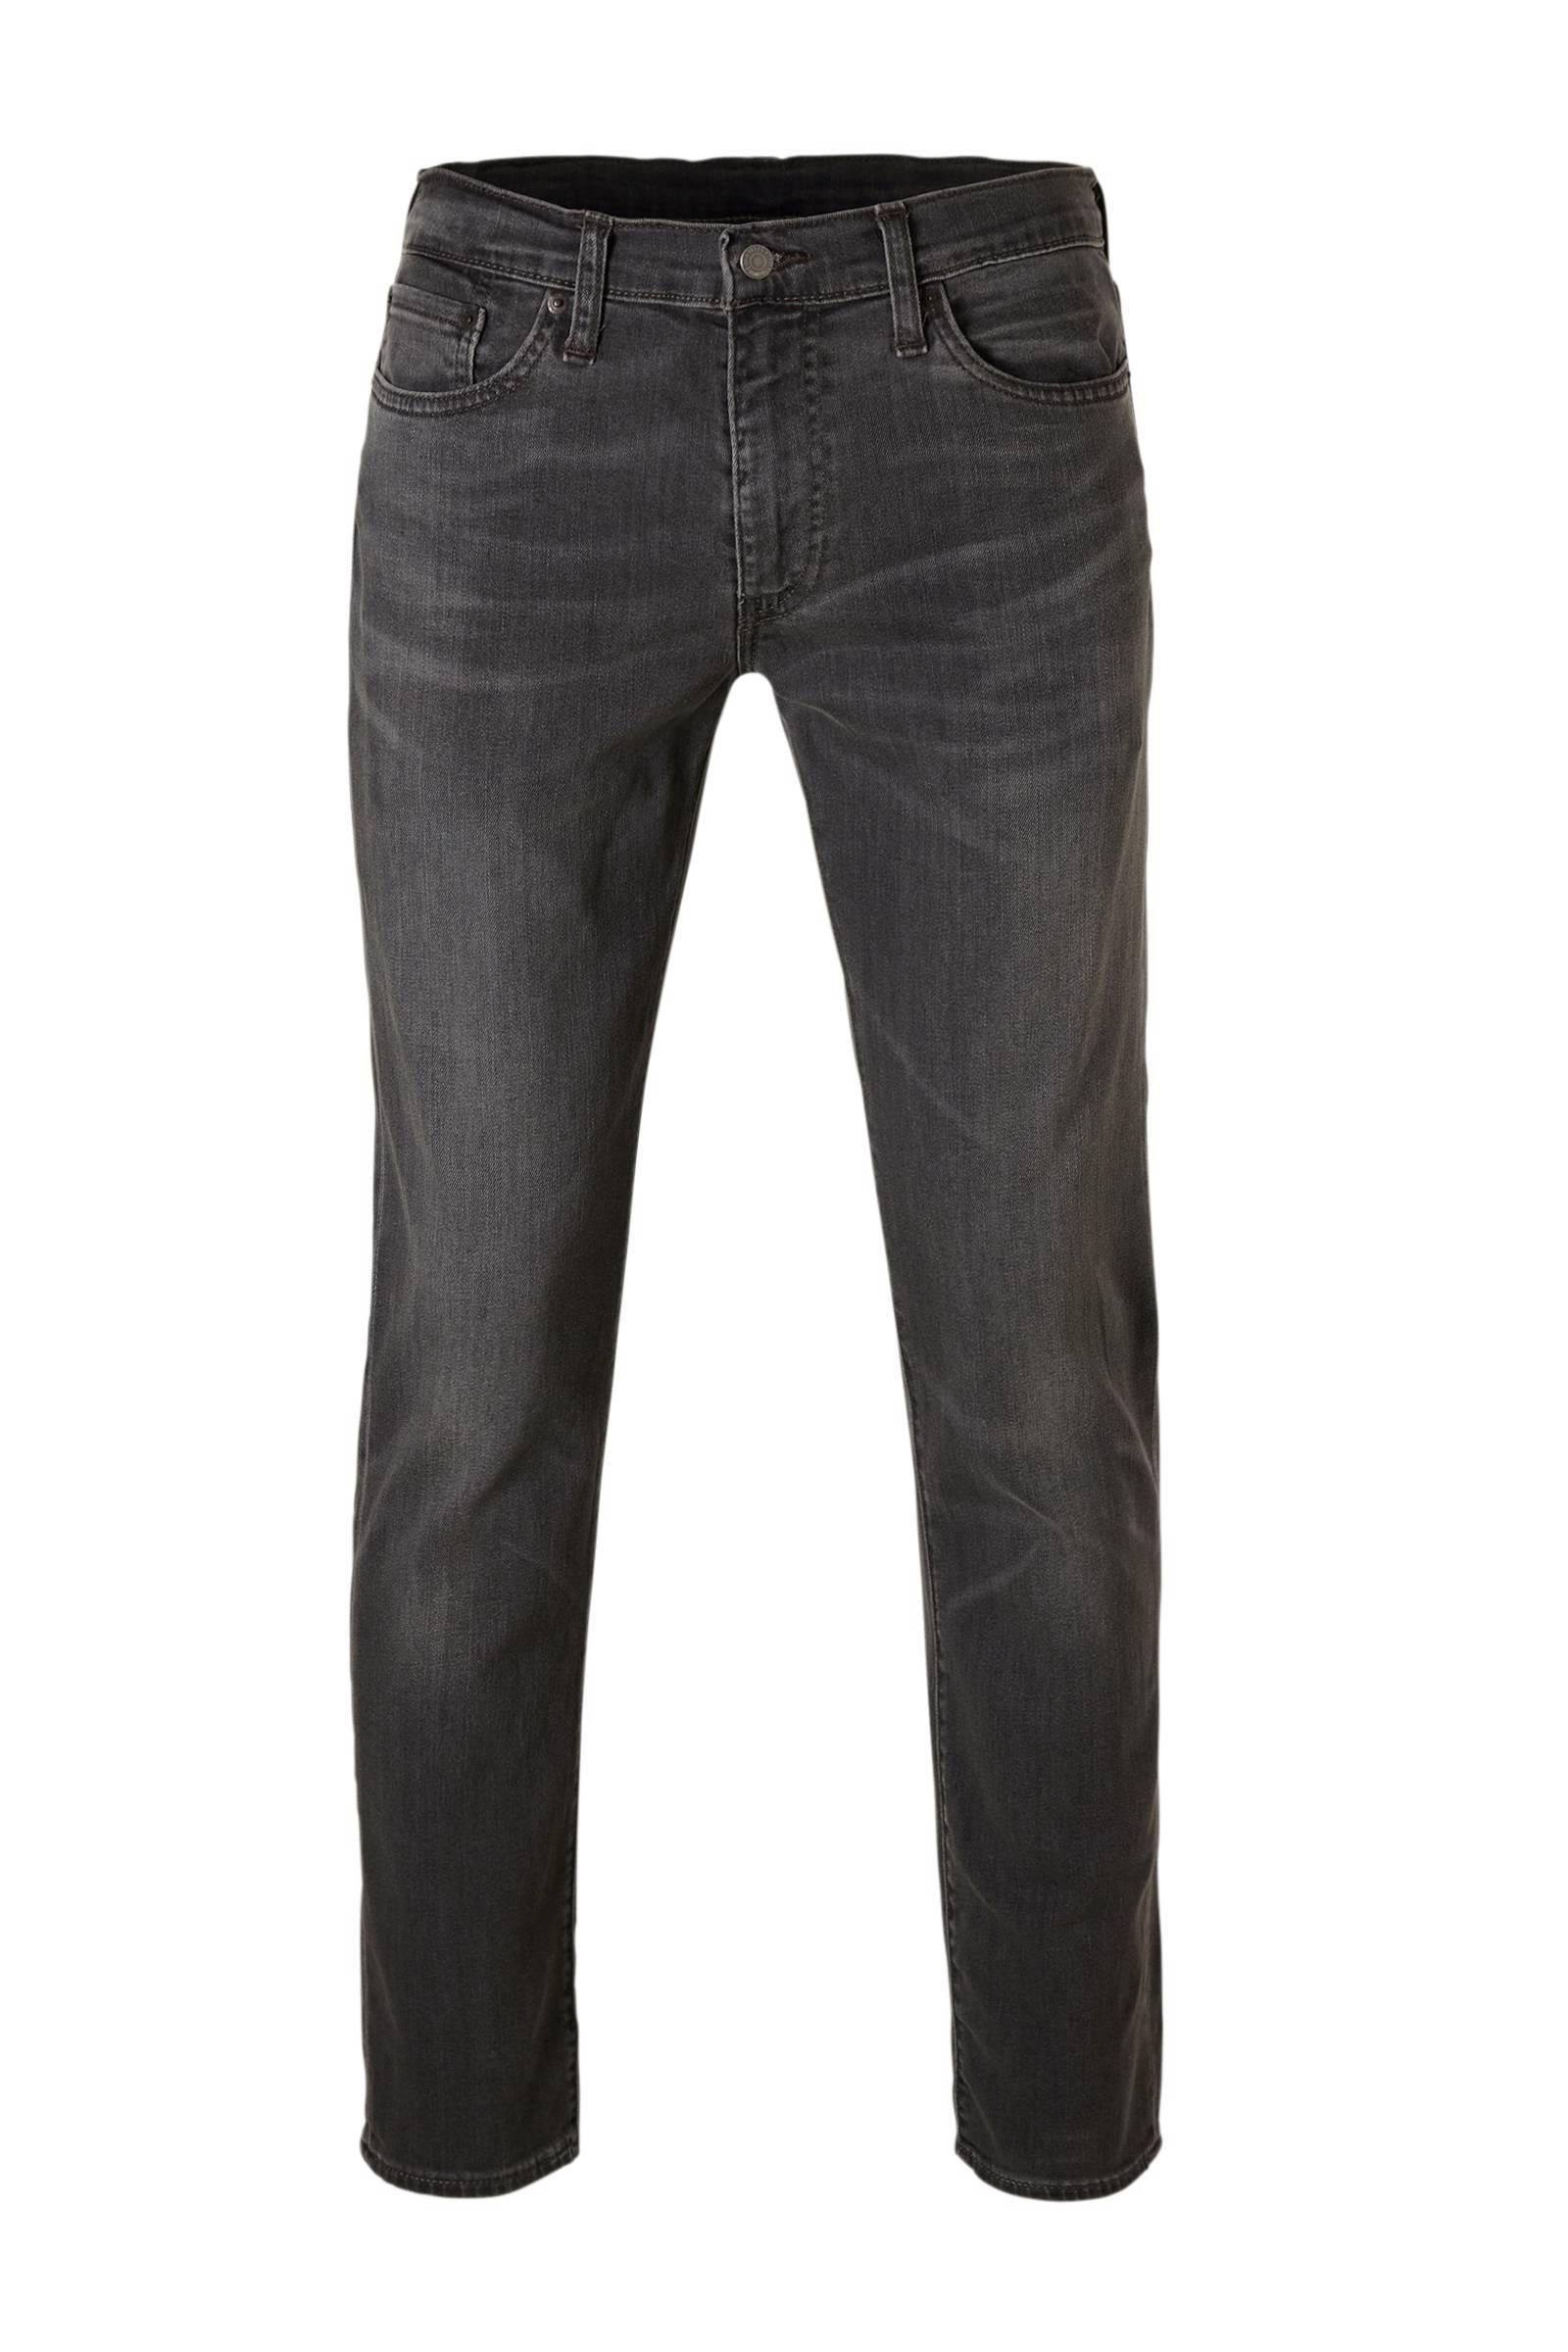 Levi's 511 slim fit jeans (heren)